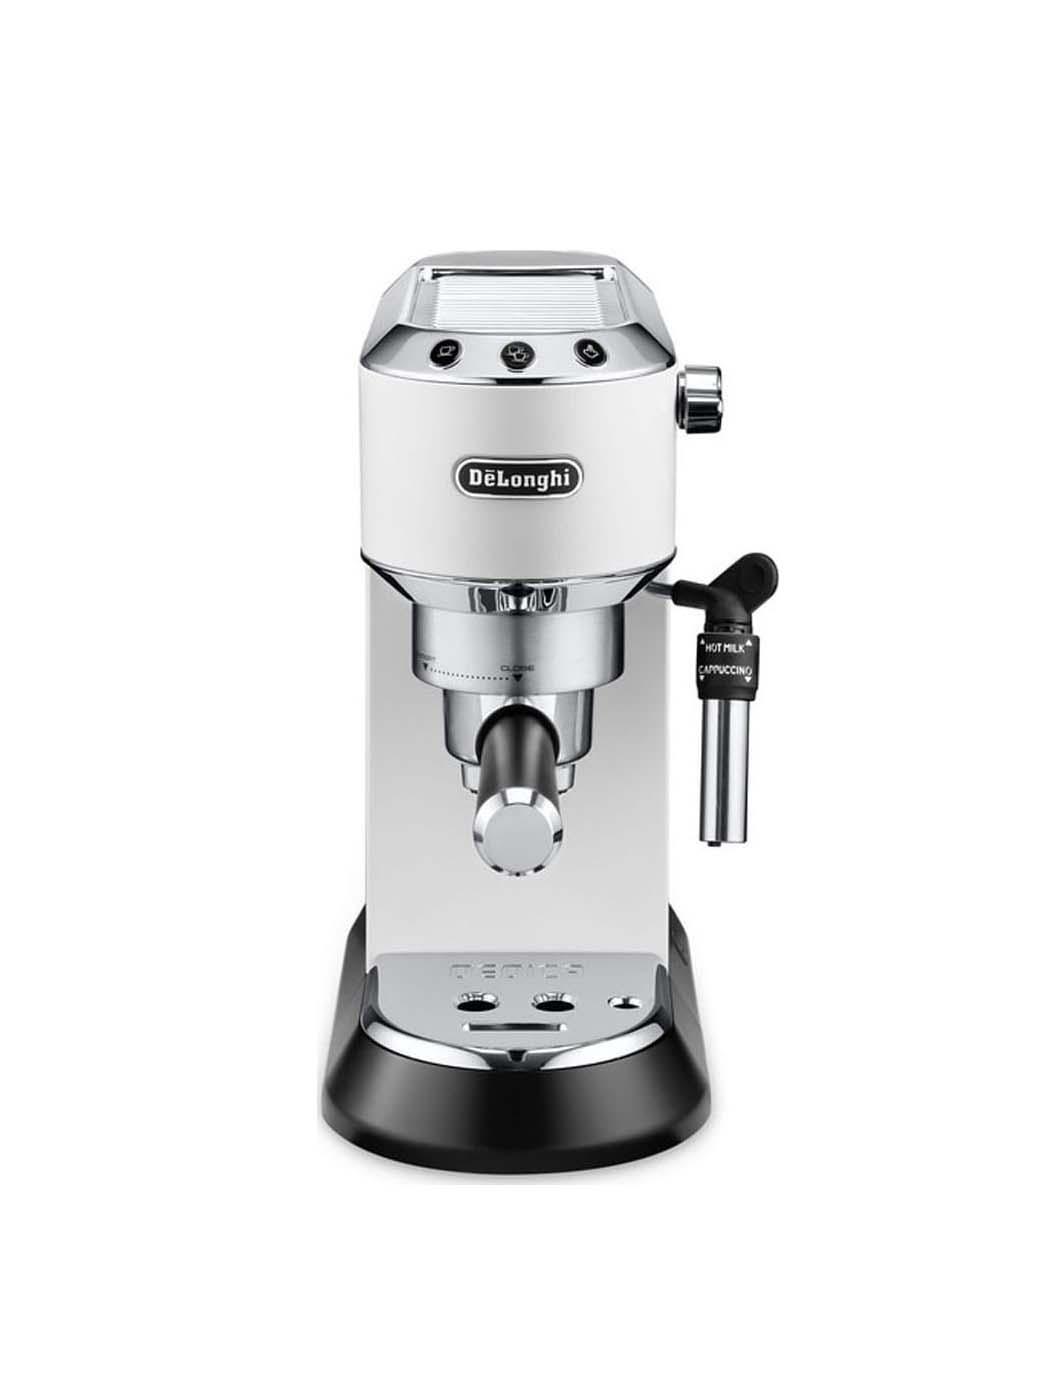 Delonghi EC 685 W Dedica Style Μηχανή Espresso Πληρωμή έως 24 δόσεις